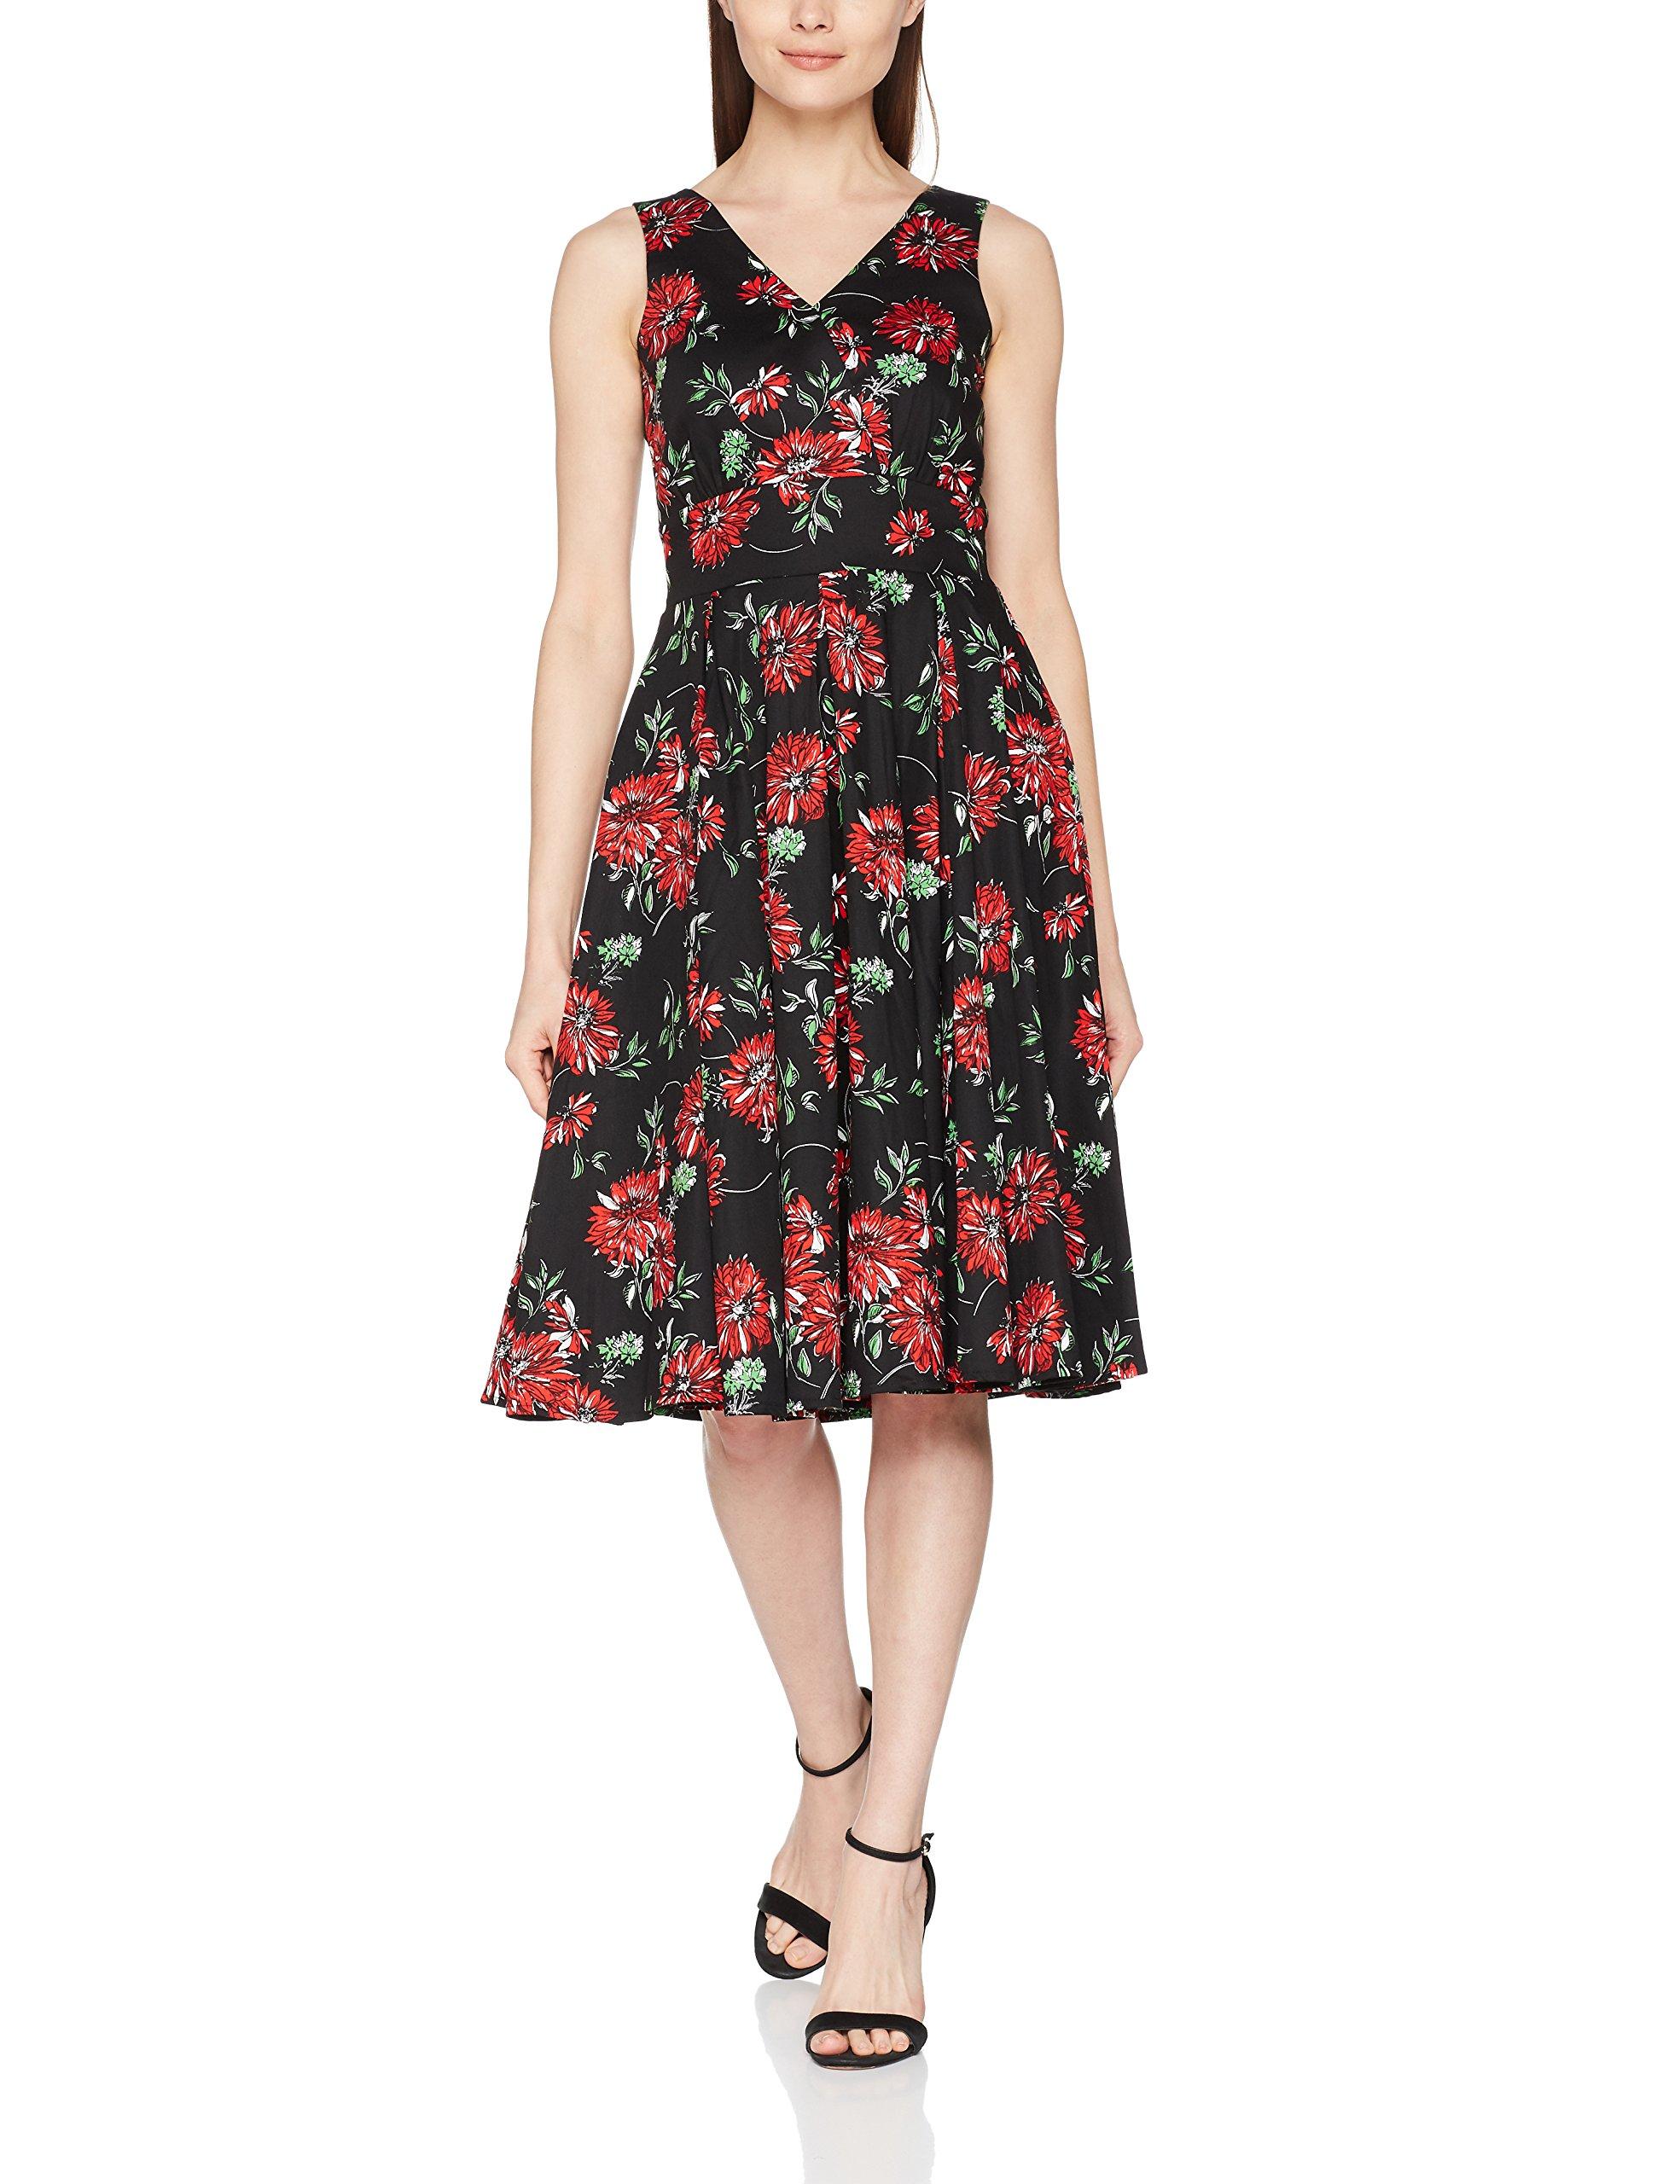 Joe Browns Dress Femme Floral RobeNoirblack Romantic Multi42 eE9I2WDHY